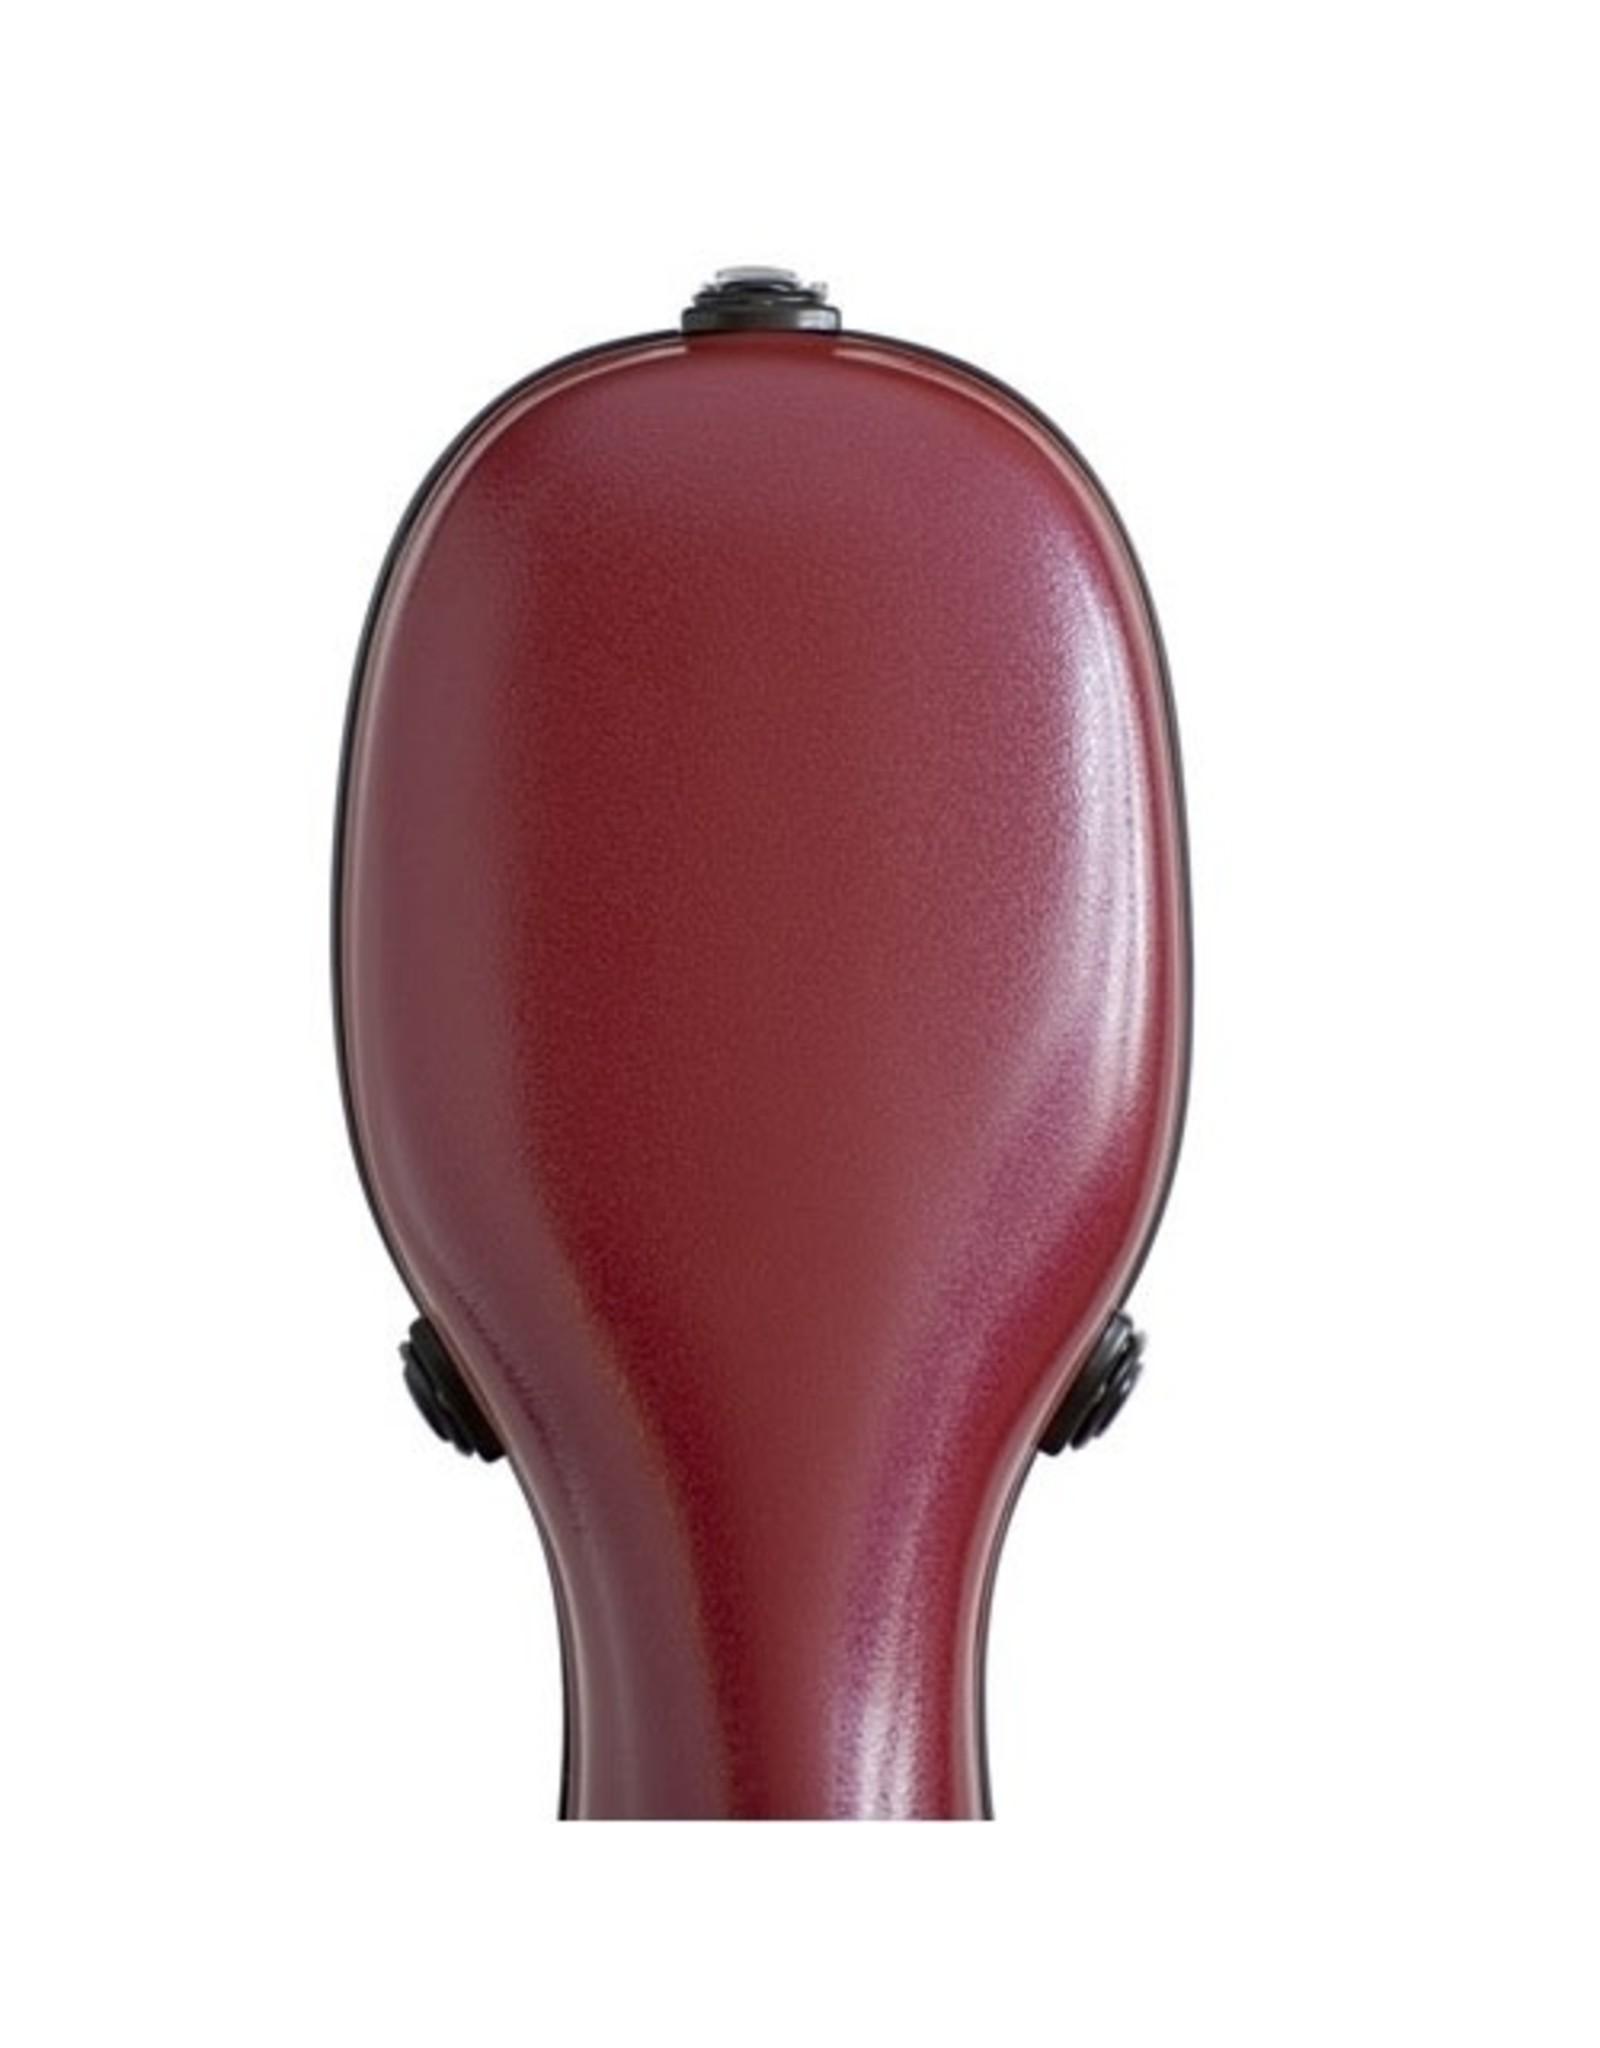 Étui Violoncelle rigide Eastman Fibertex (fibre de verre)